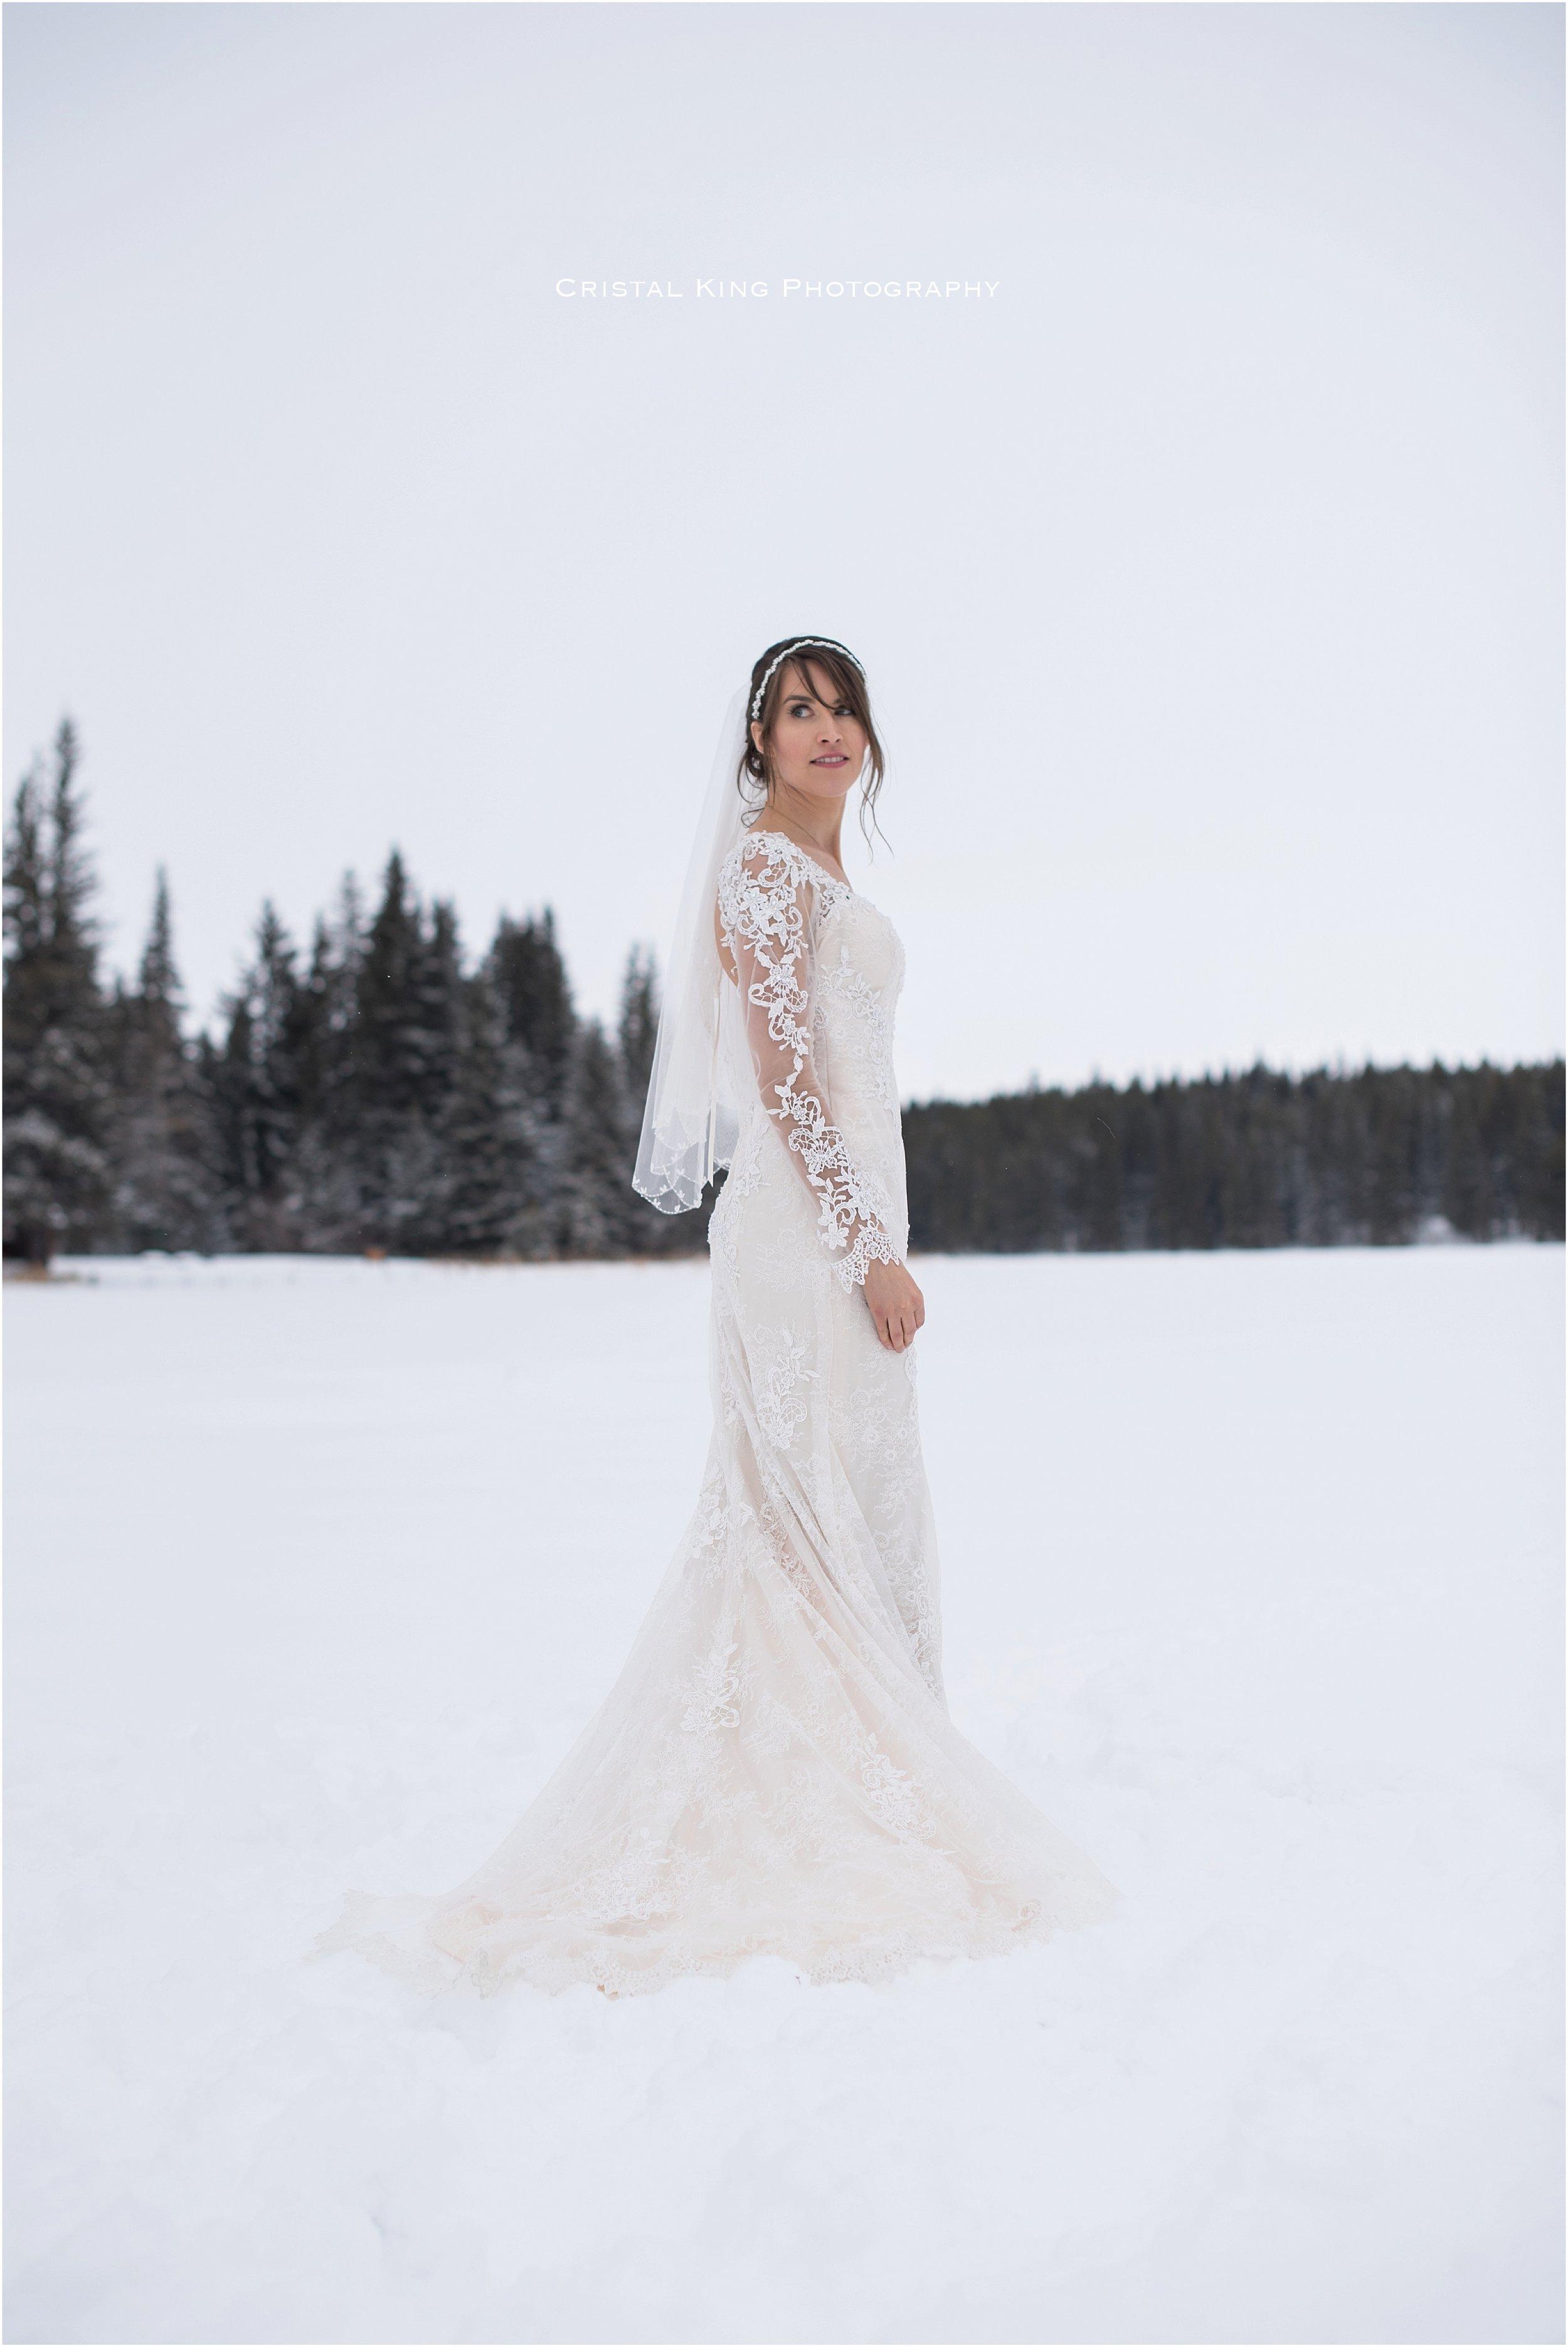 Jacqueline-Jasons-Wedding-107.jpg